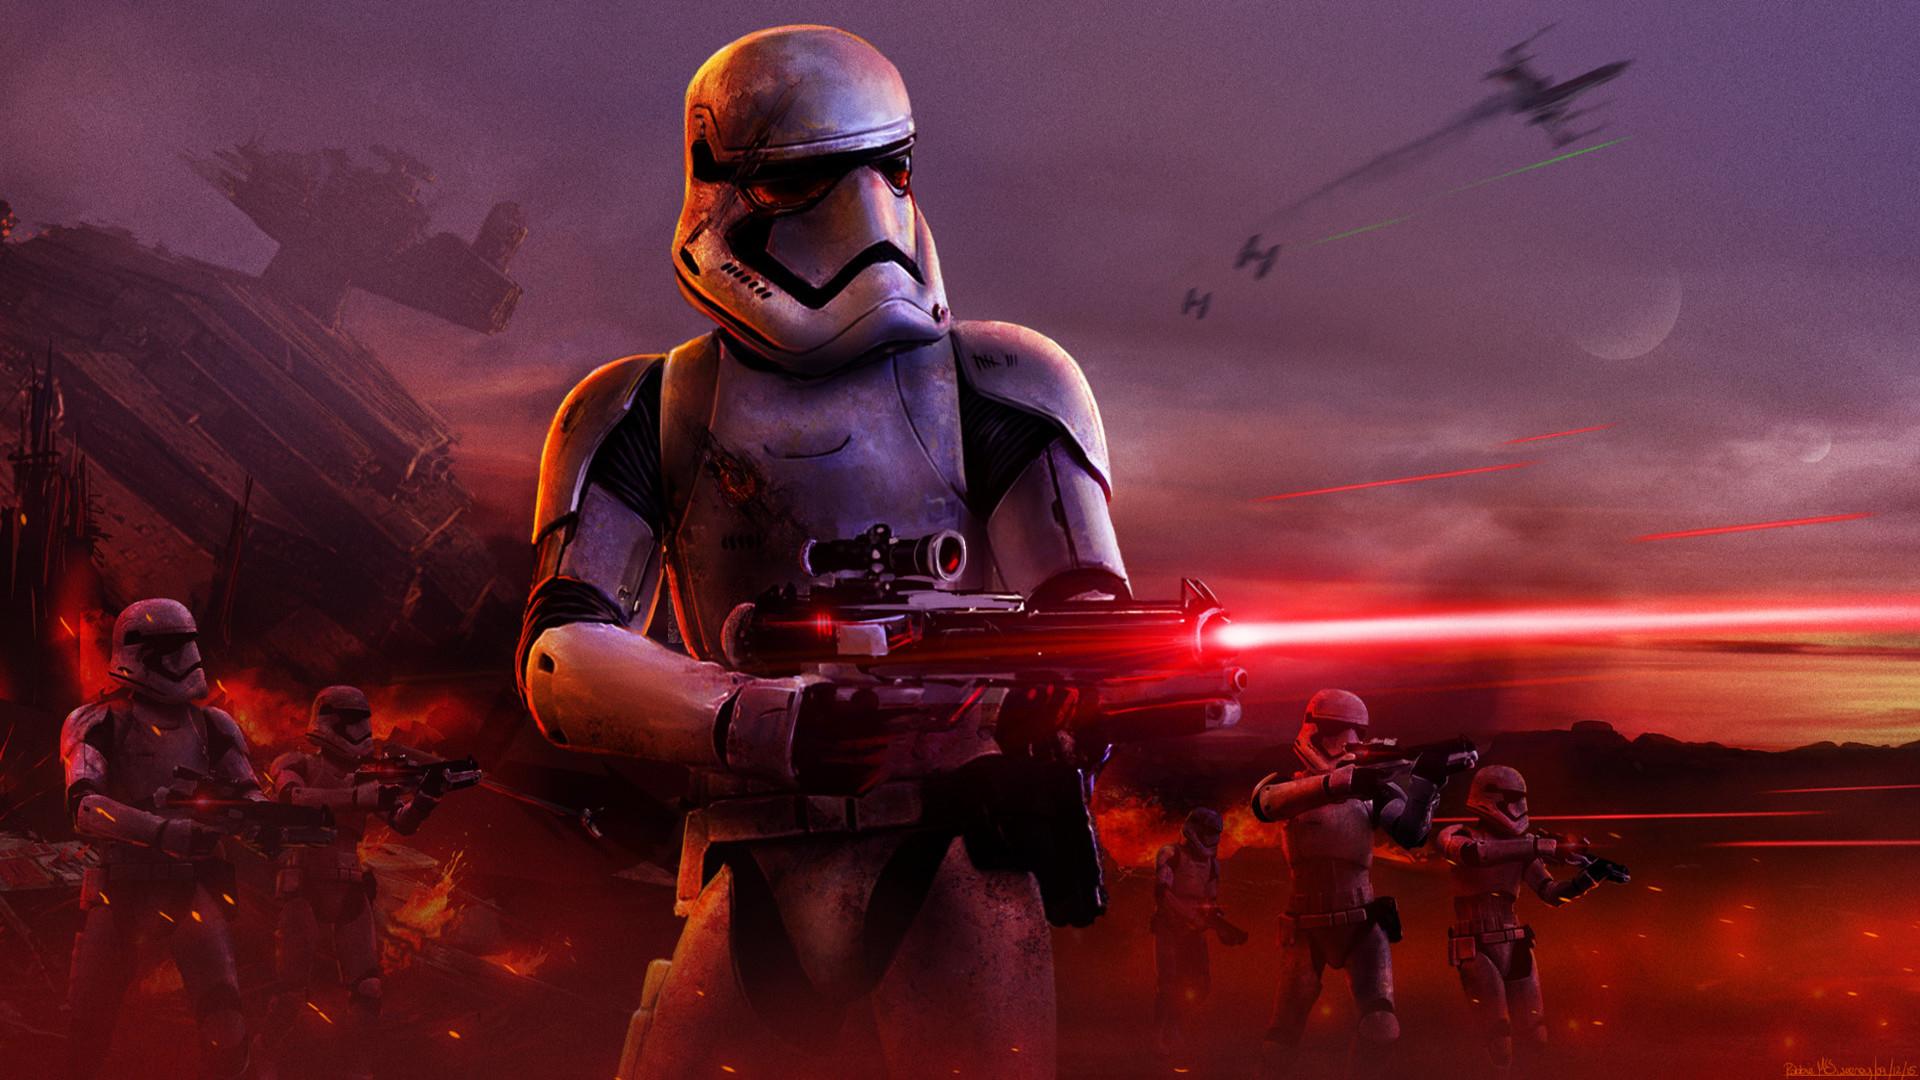 Stormtrooper Wallpaper, HD Movies 4K